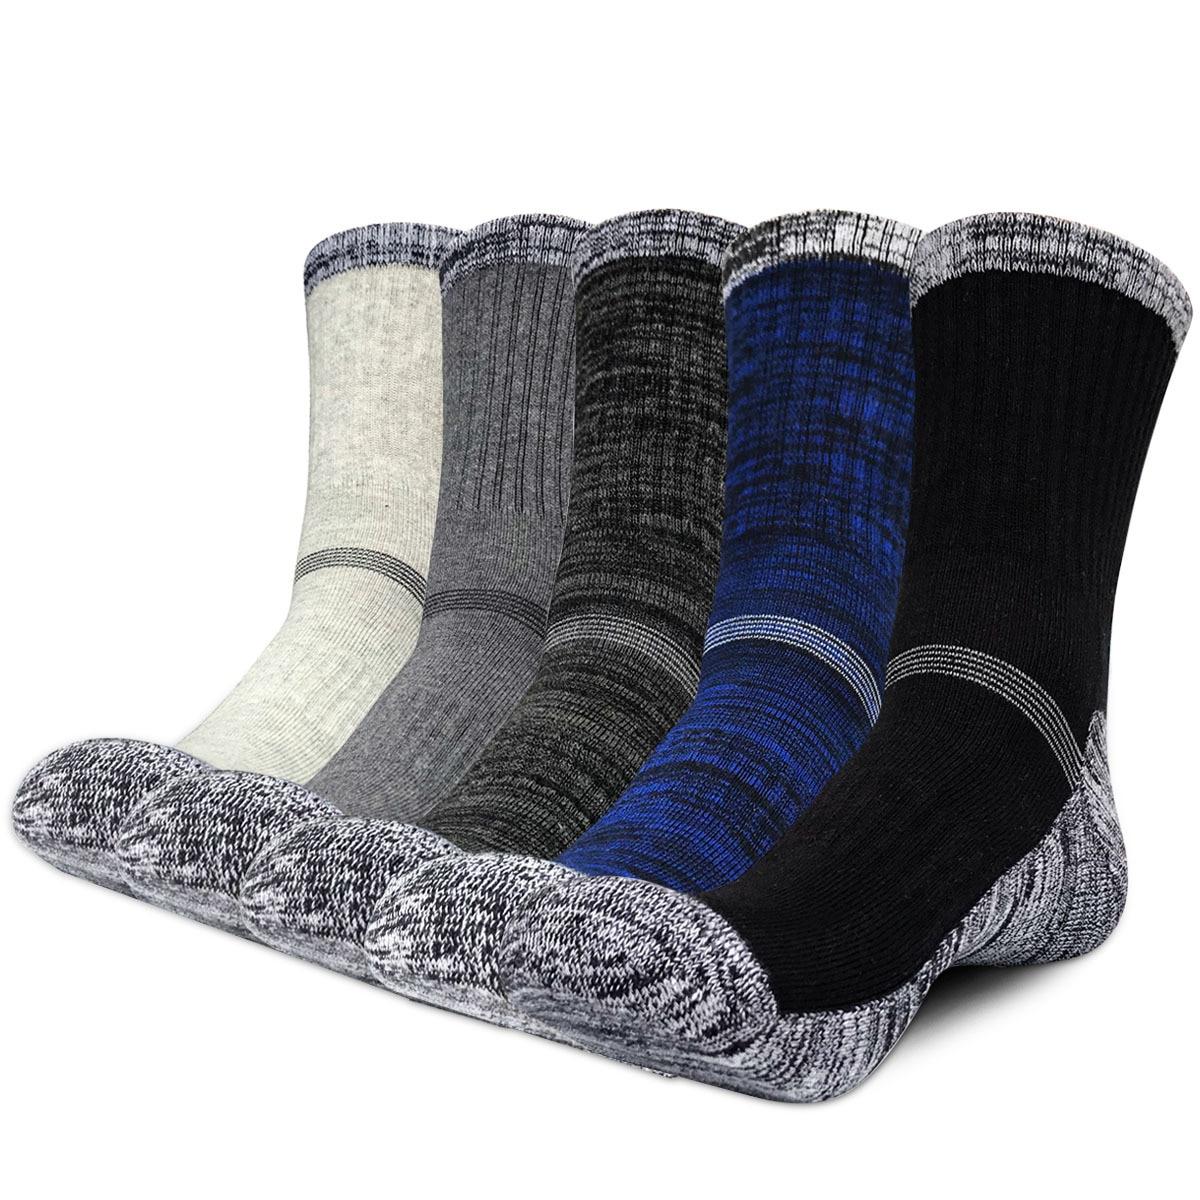 Winter Men   Socks   Thicken Thermal Wool Pile Cashmere Snow   Socks   Climbing Hiking Sport Seamless Boots Floor Sleeping   Socks   For Men